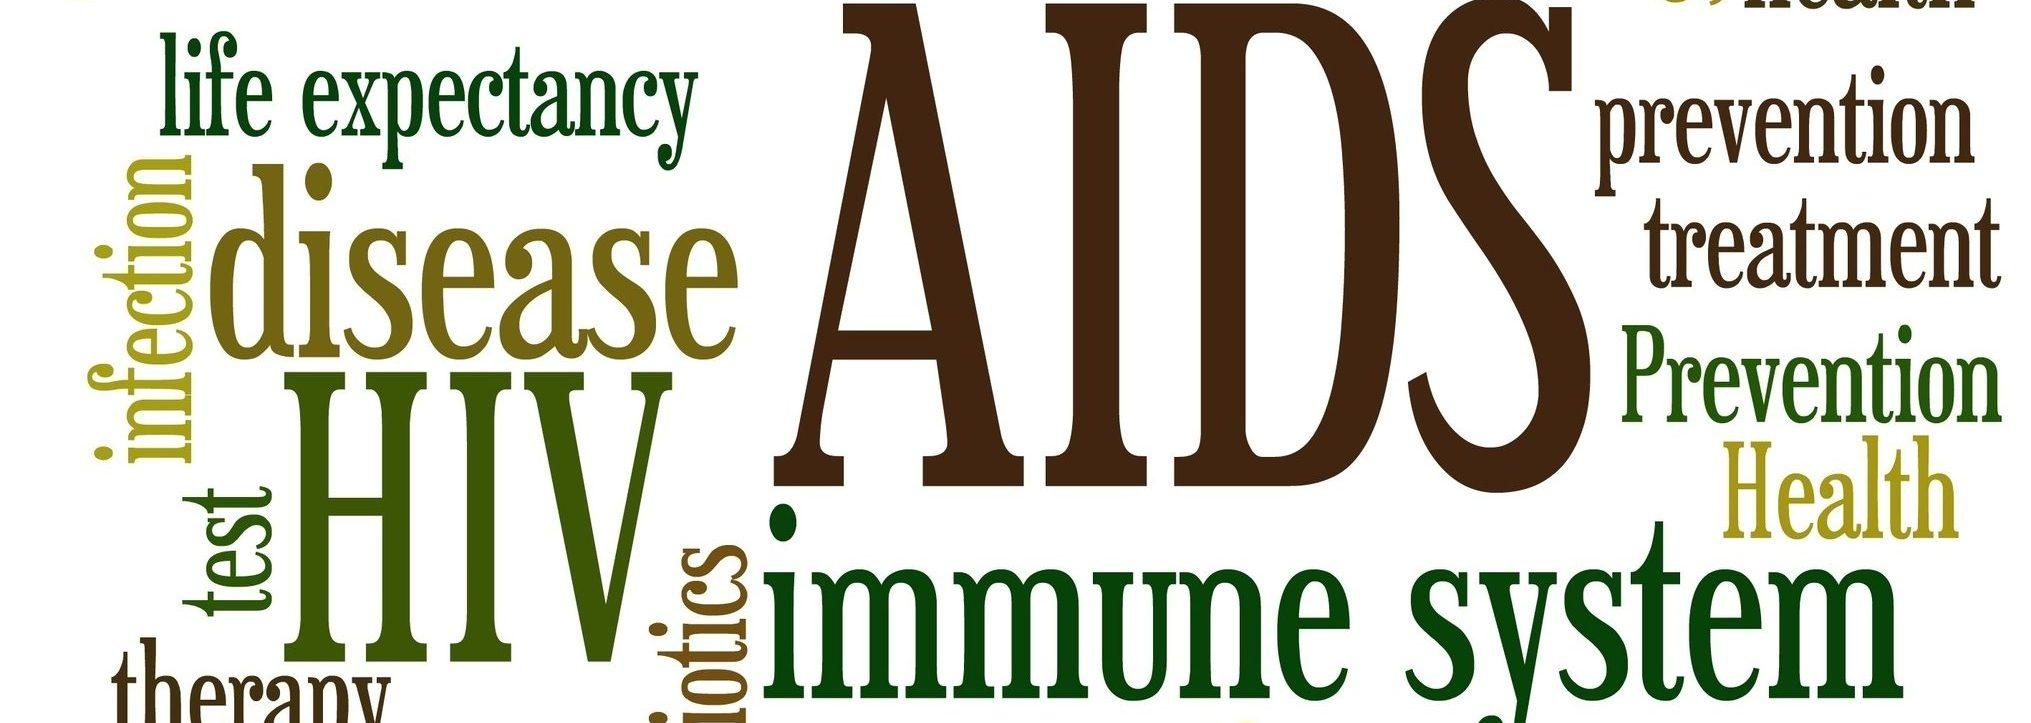 HIV Aids training